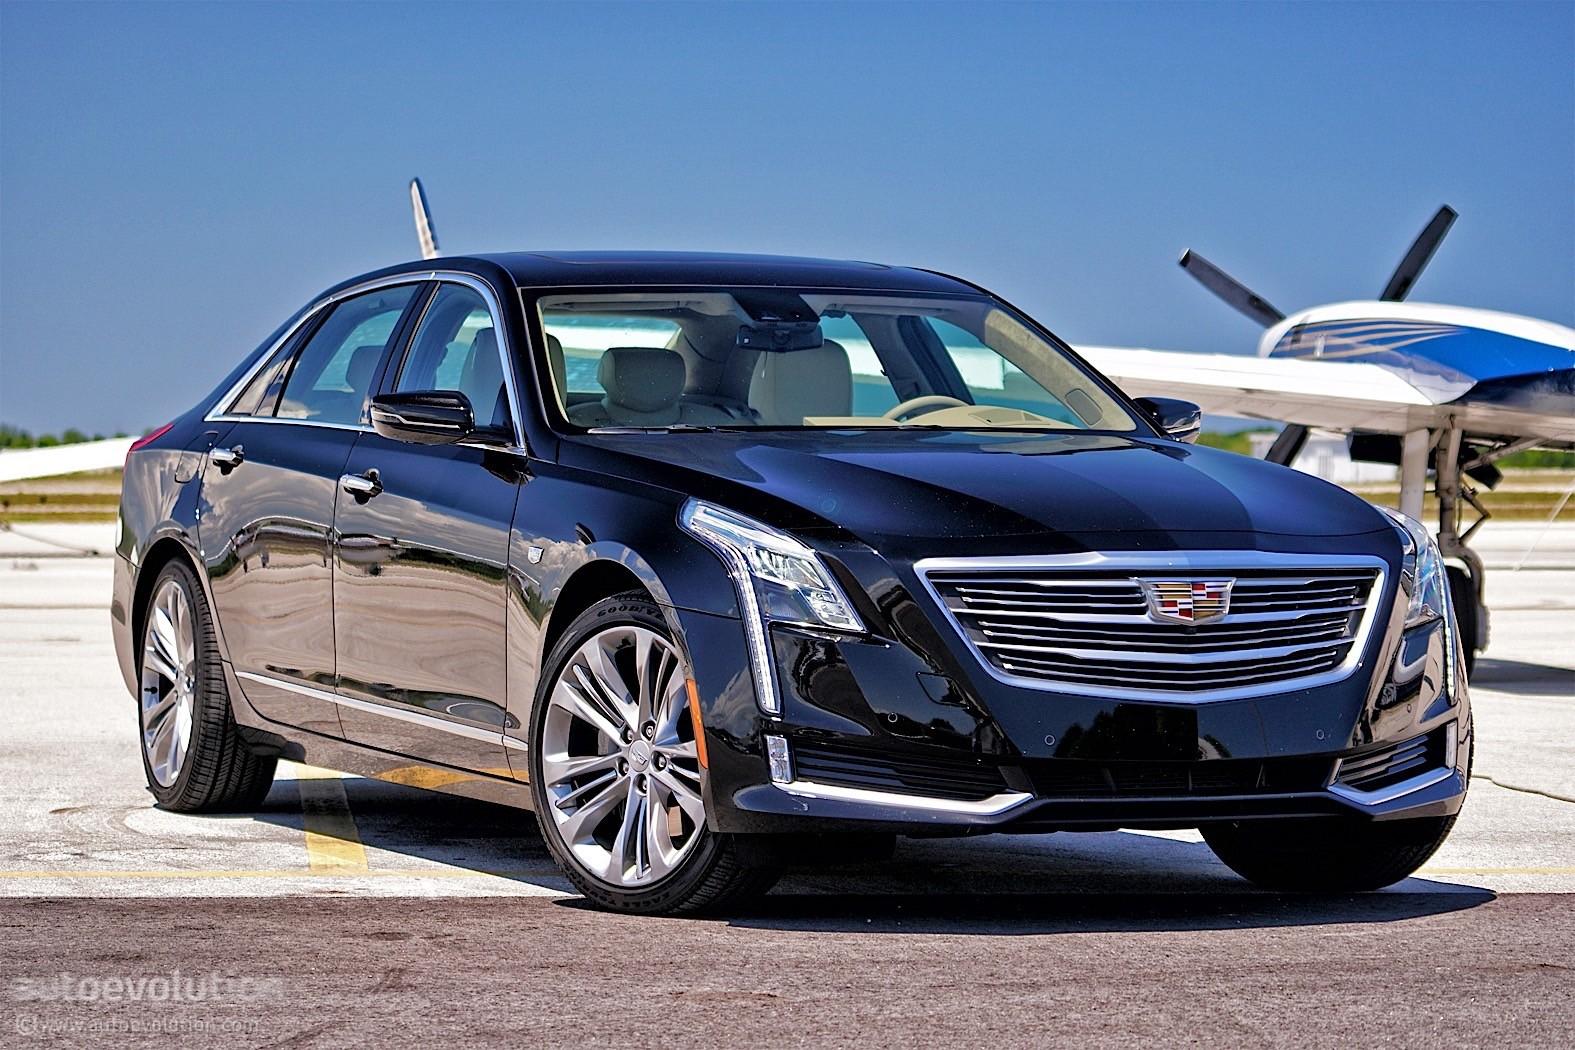 2017 Xt5 Cadillac >> Driven: 2016 Cadillac CT6 Platinum AWD - autoevolution